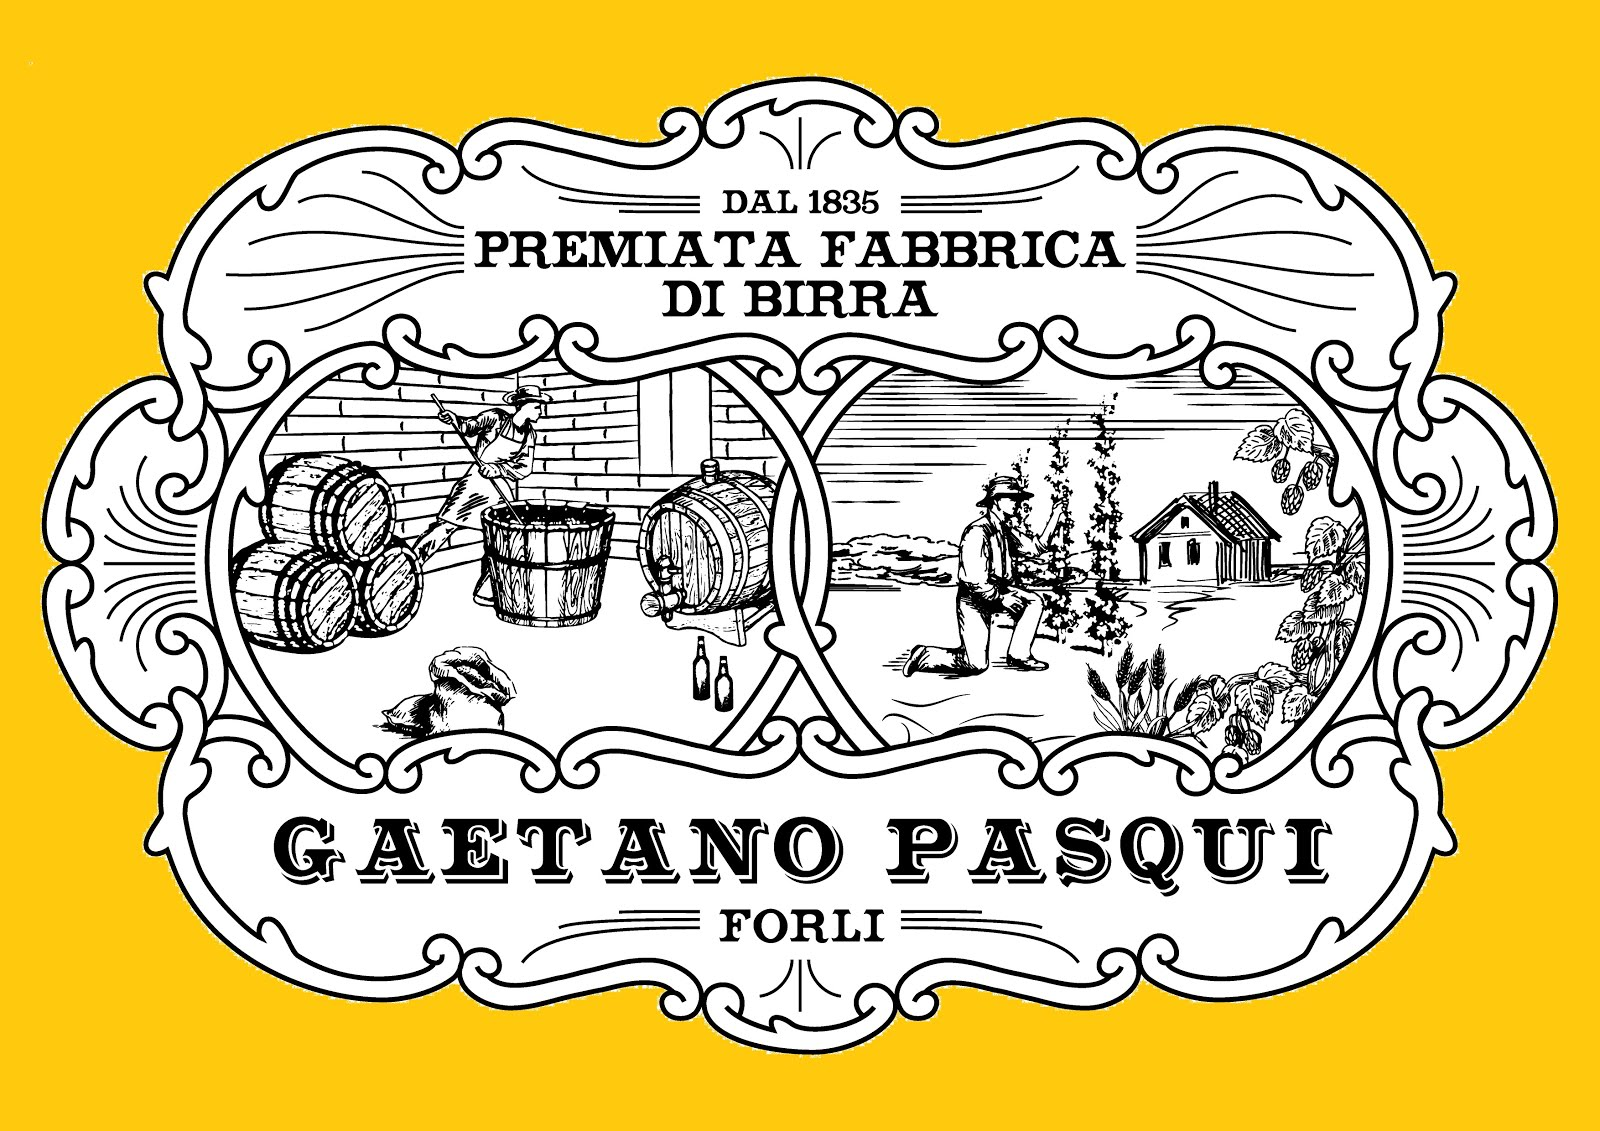 Premiata Fabbrica di Birra Gaetano Pasqui - Forlì